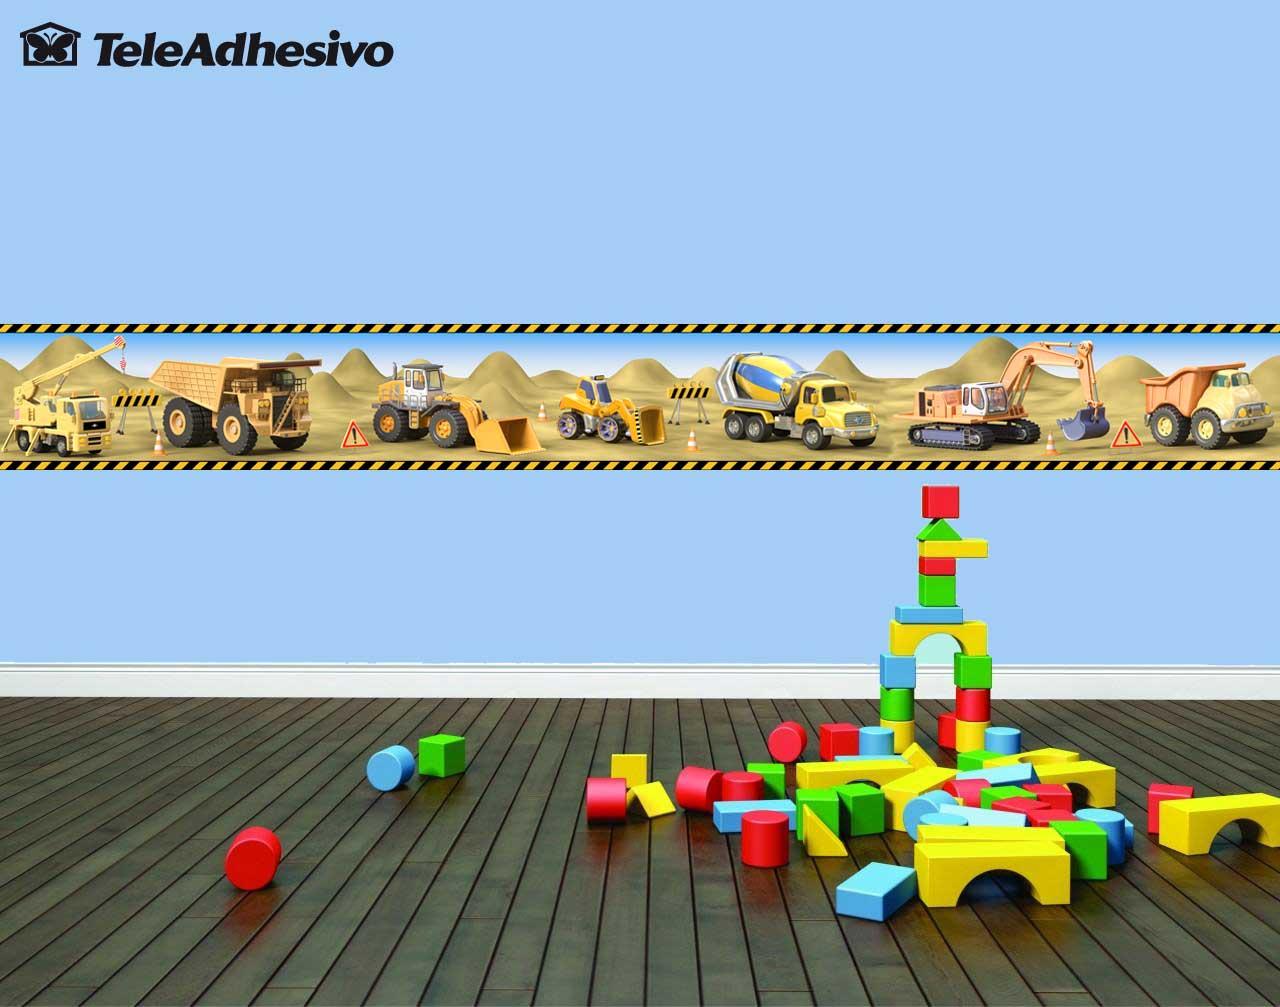 Cenefa de maquinaria de construcci n blog teleadhesivo - Cenefas de papel infantiles ...